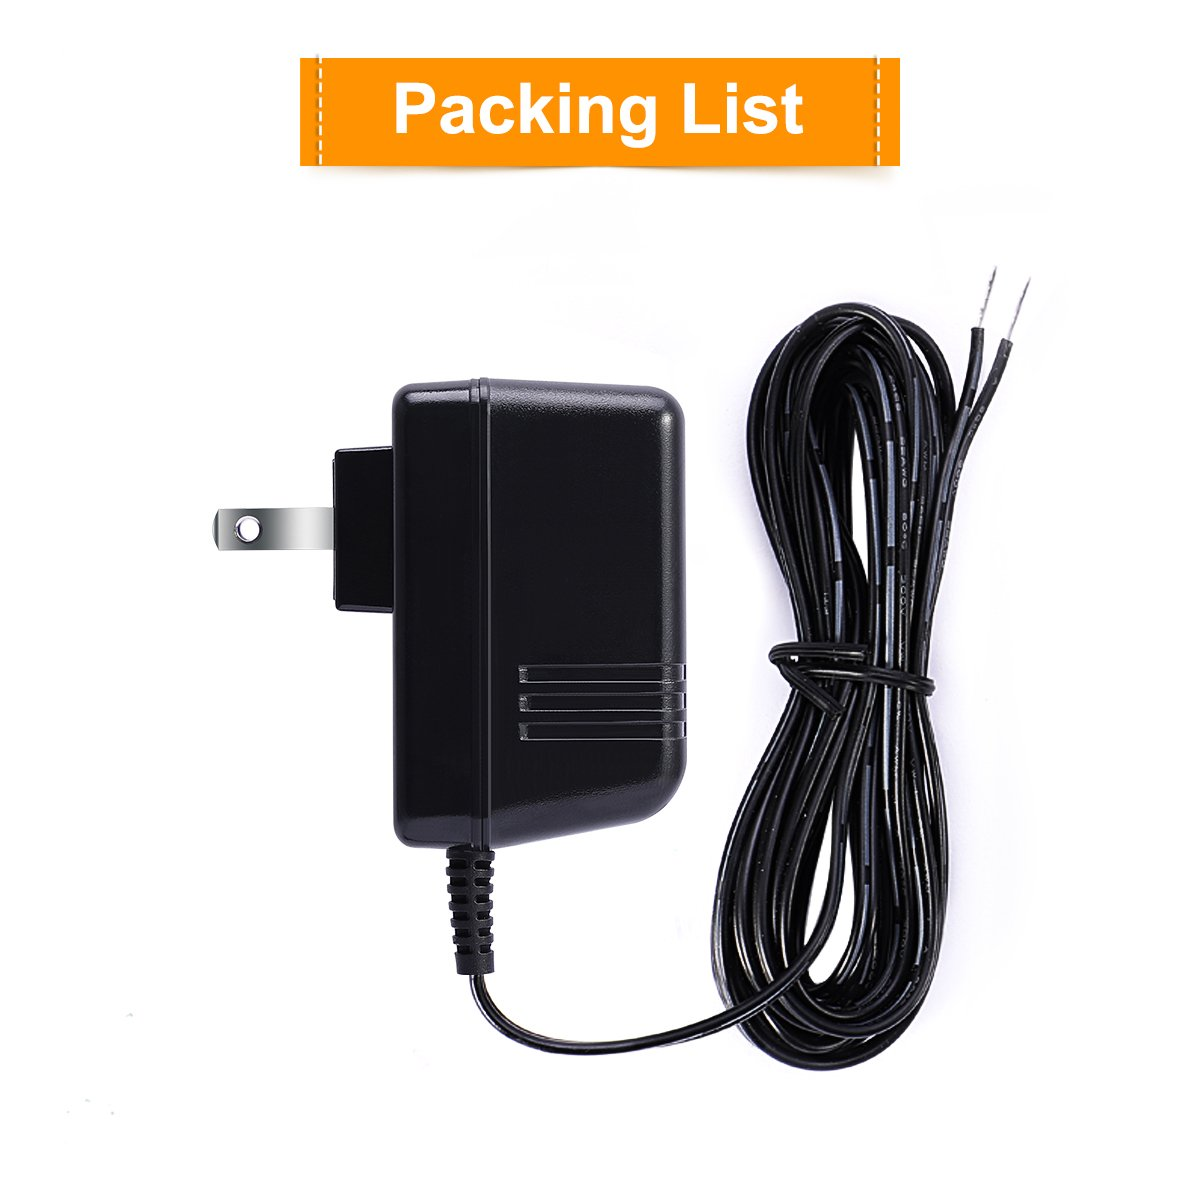 24V Thermostat Transformer,LANMU AC 24V C-Wire Power Supply Adapter on